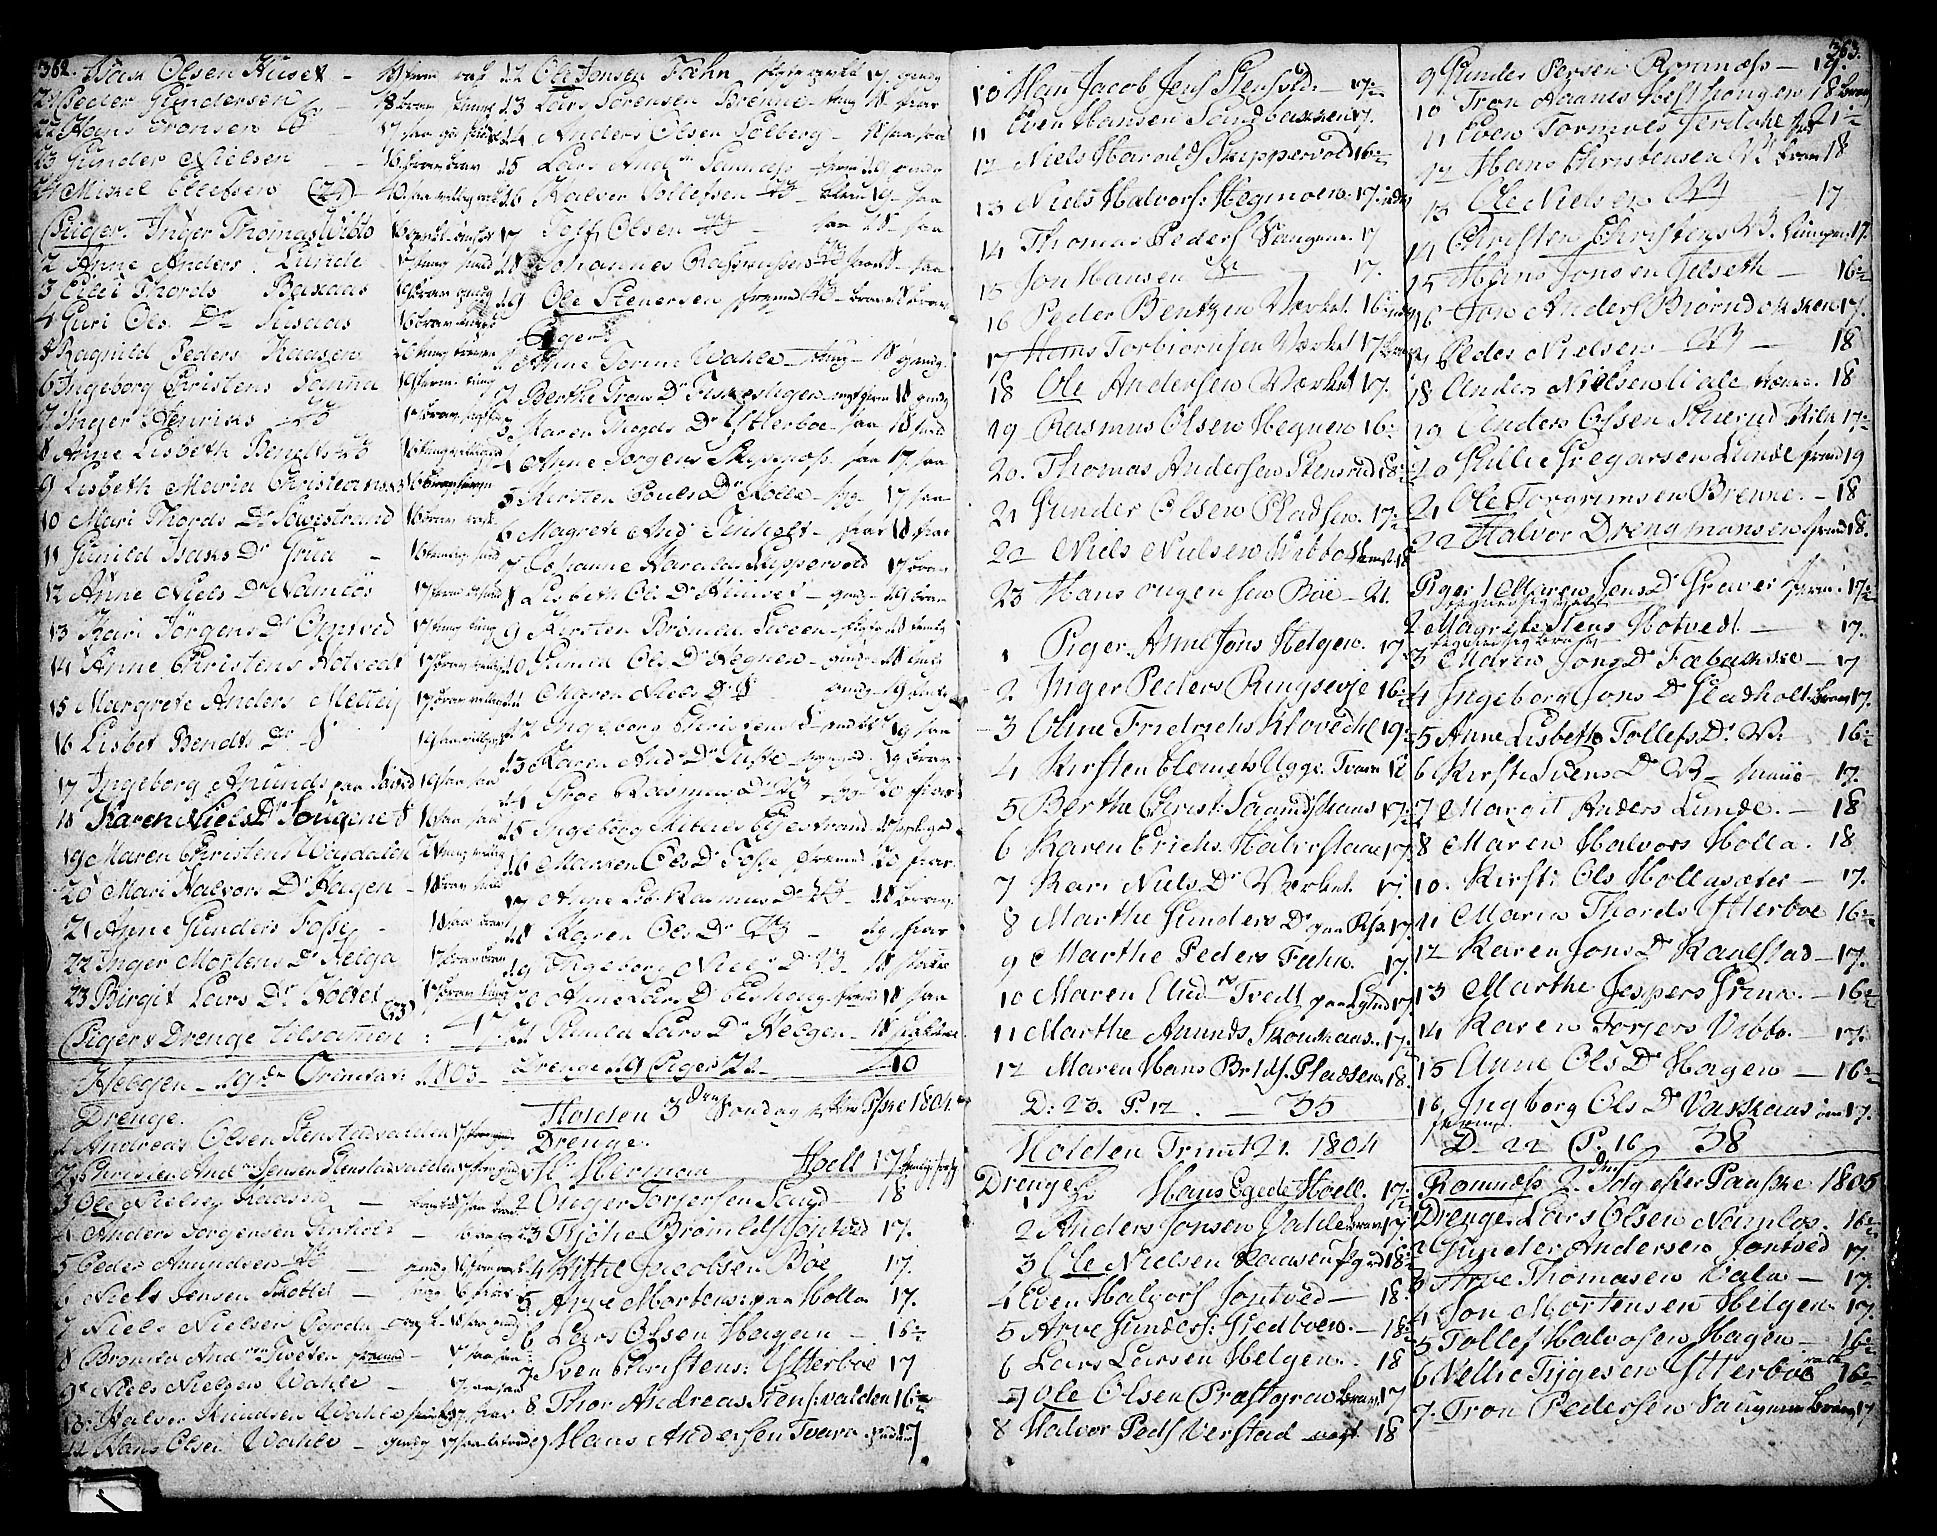 SAKO, Holla kirkebøker, F/Fa/L0002: Ministerialbok nr. 2, 1779-1814, s. 362-363